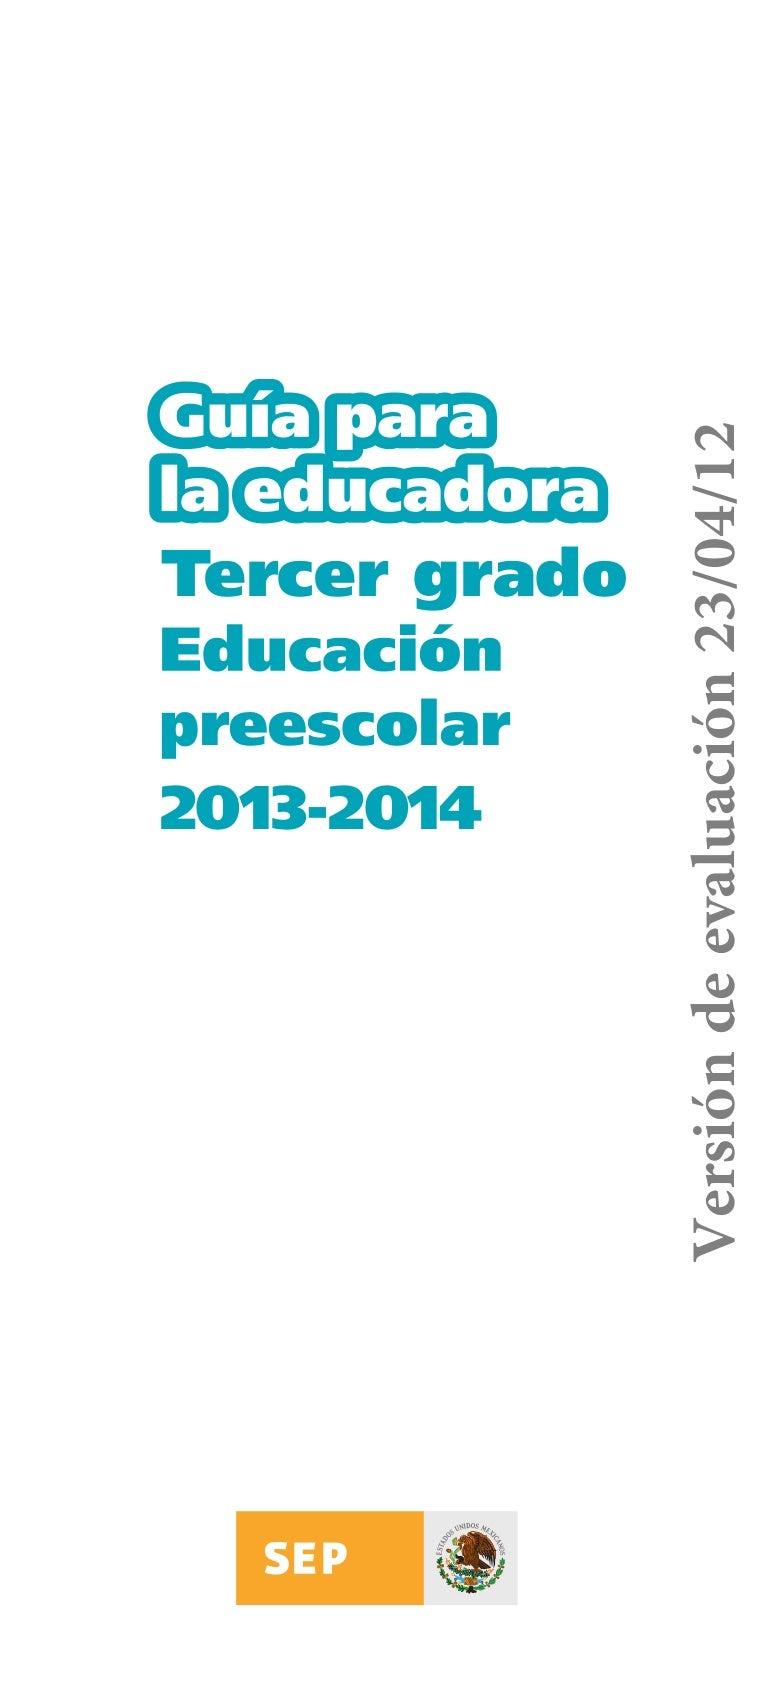 Guiaparalaeducadoratercergrado 2013-2014-130317214422-phpapp01